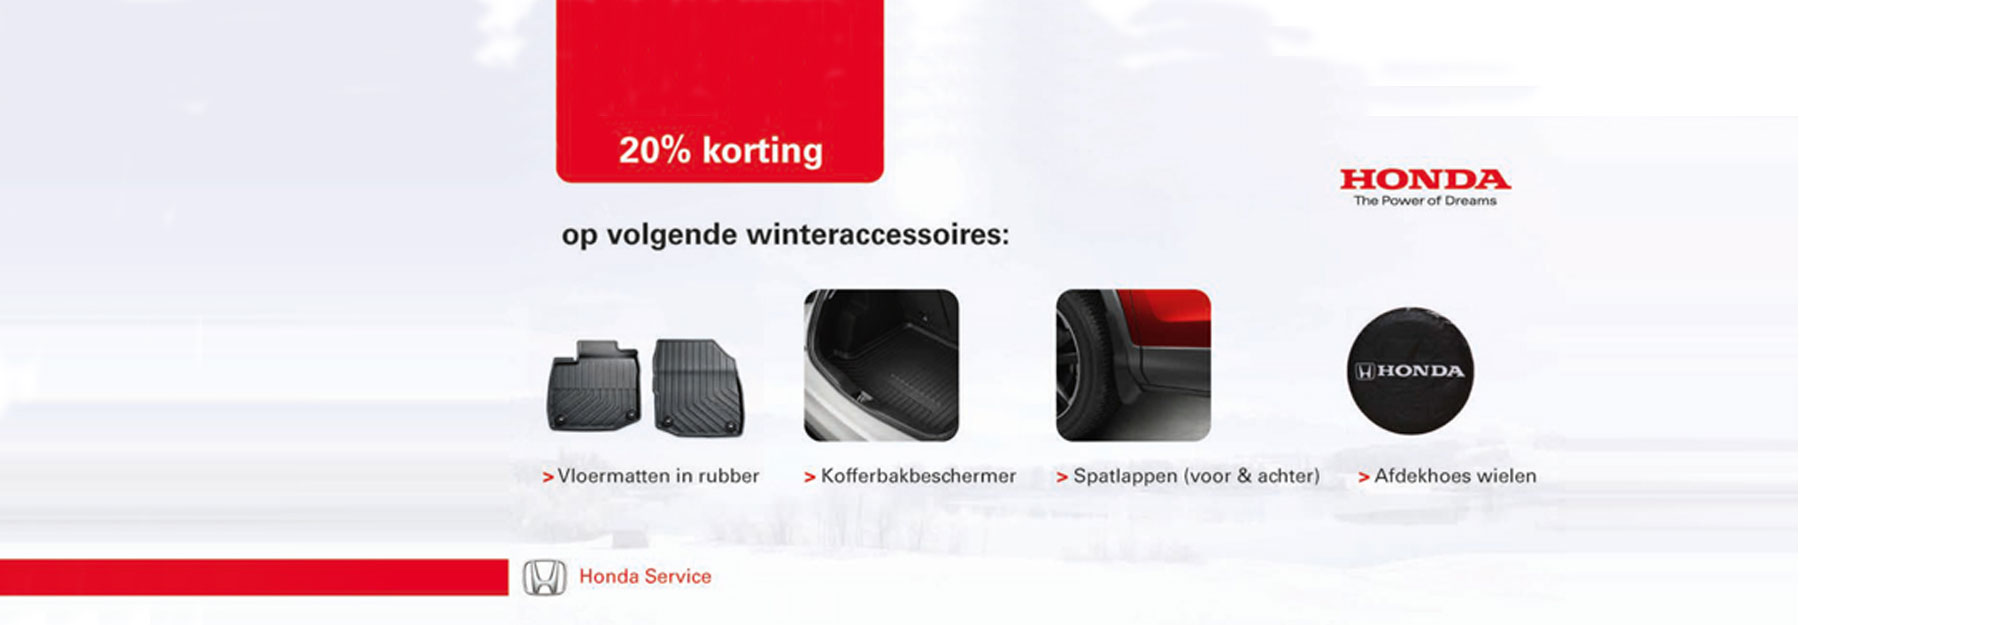 GARAGE-Vabis-Honda-korting-op-winteraccessoires-2000x625